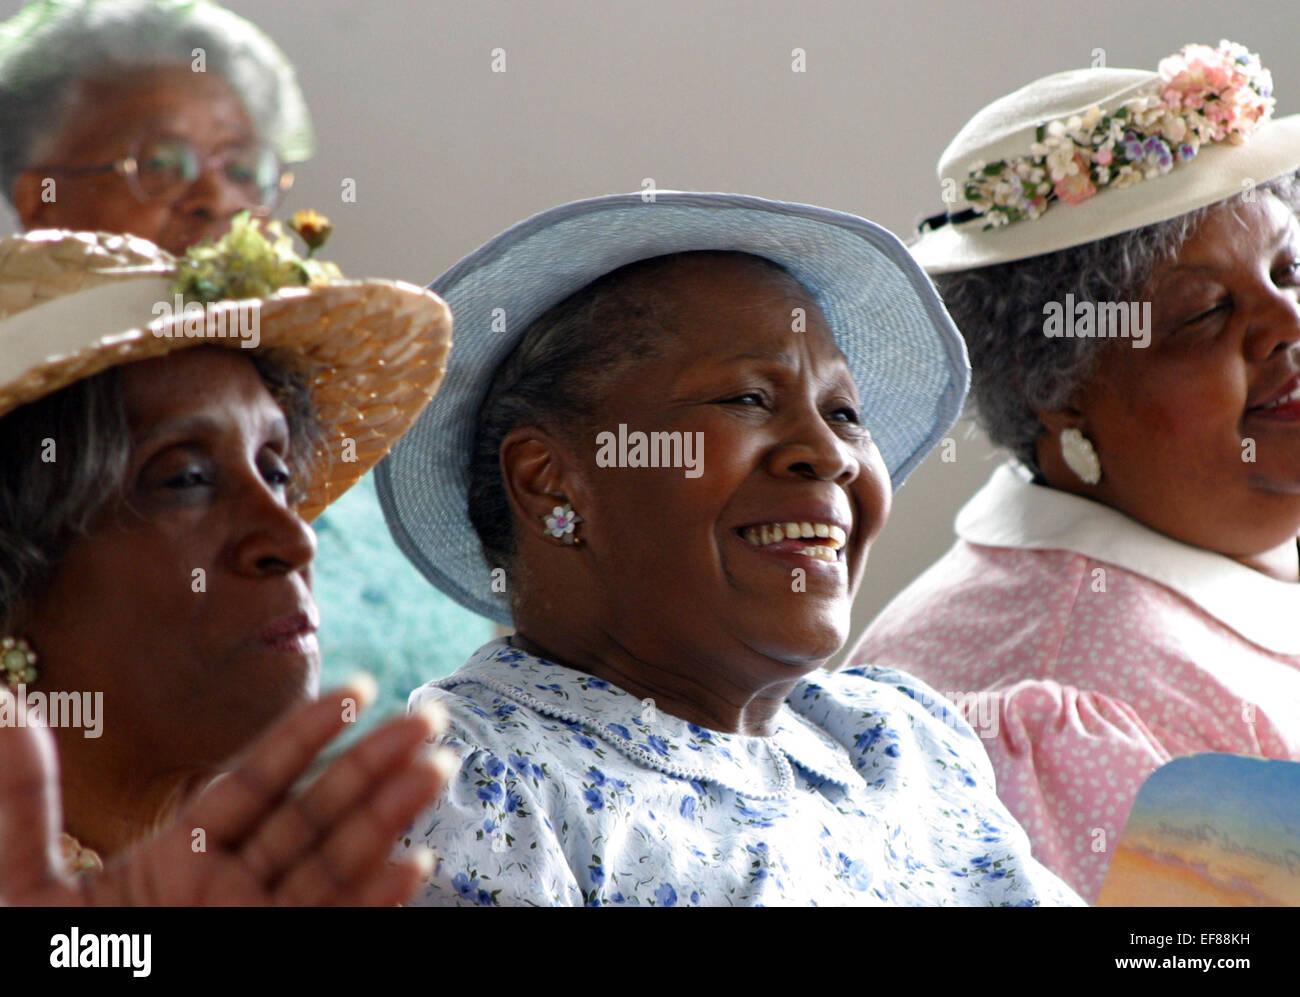 IRMA LADYKILLERS (2004) Stockbild